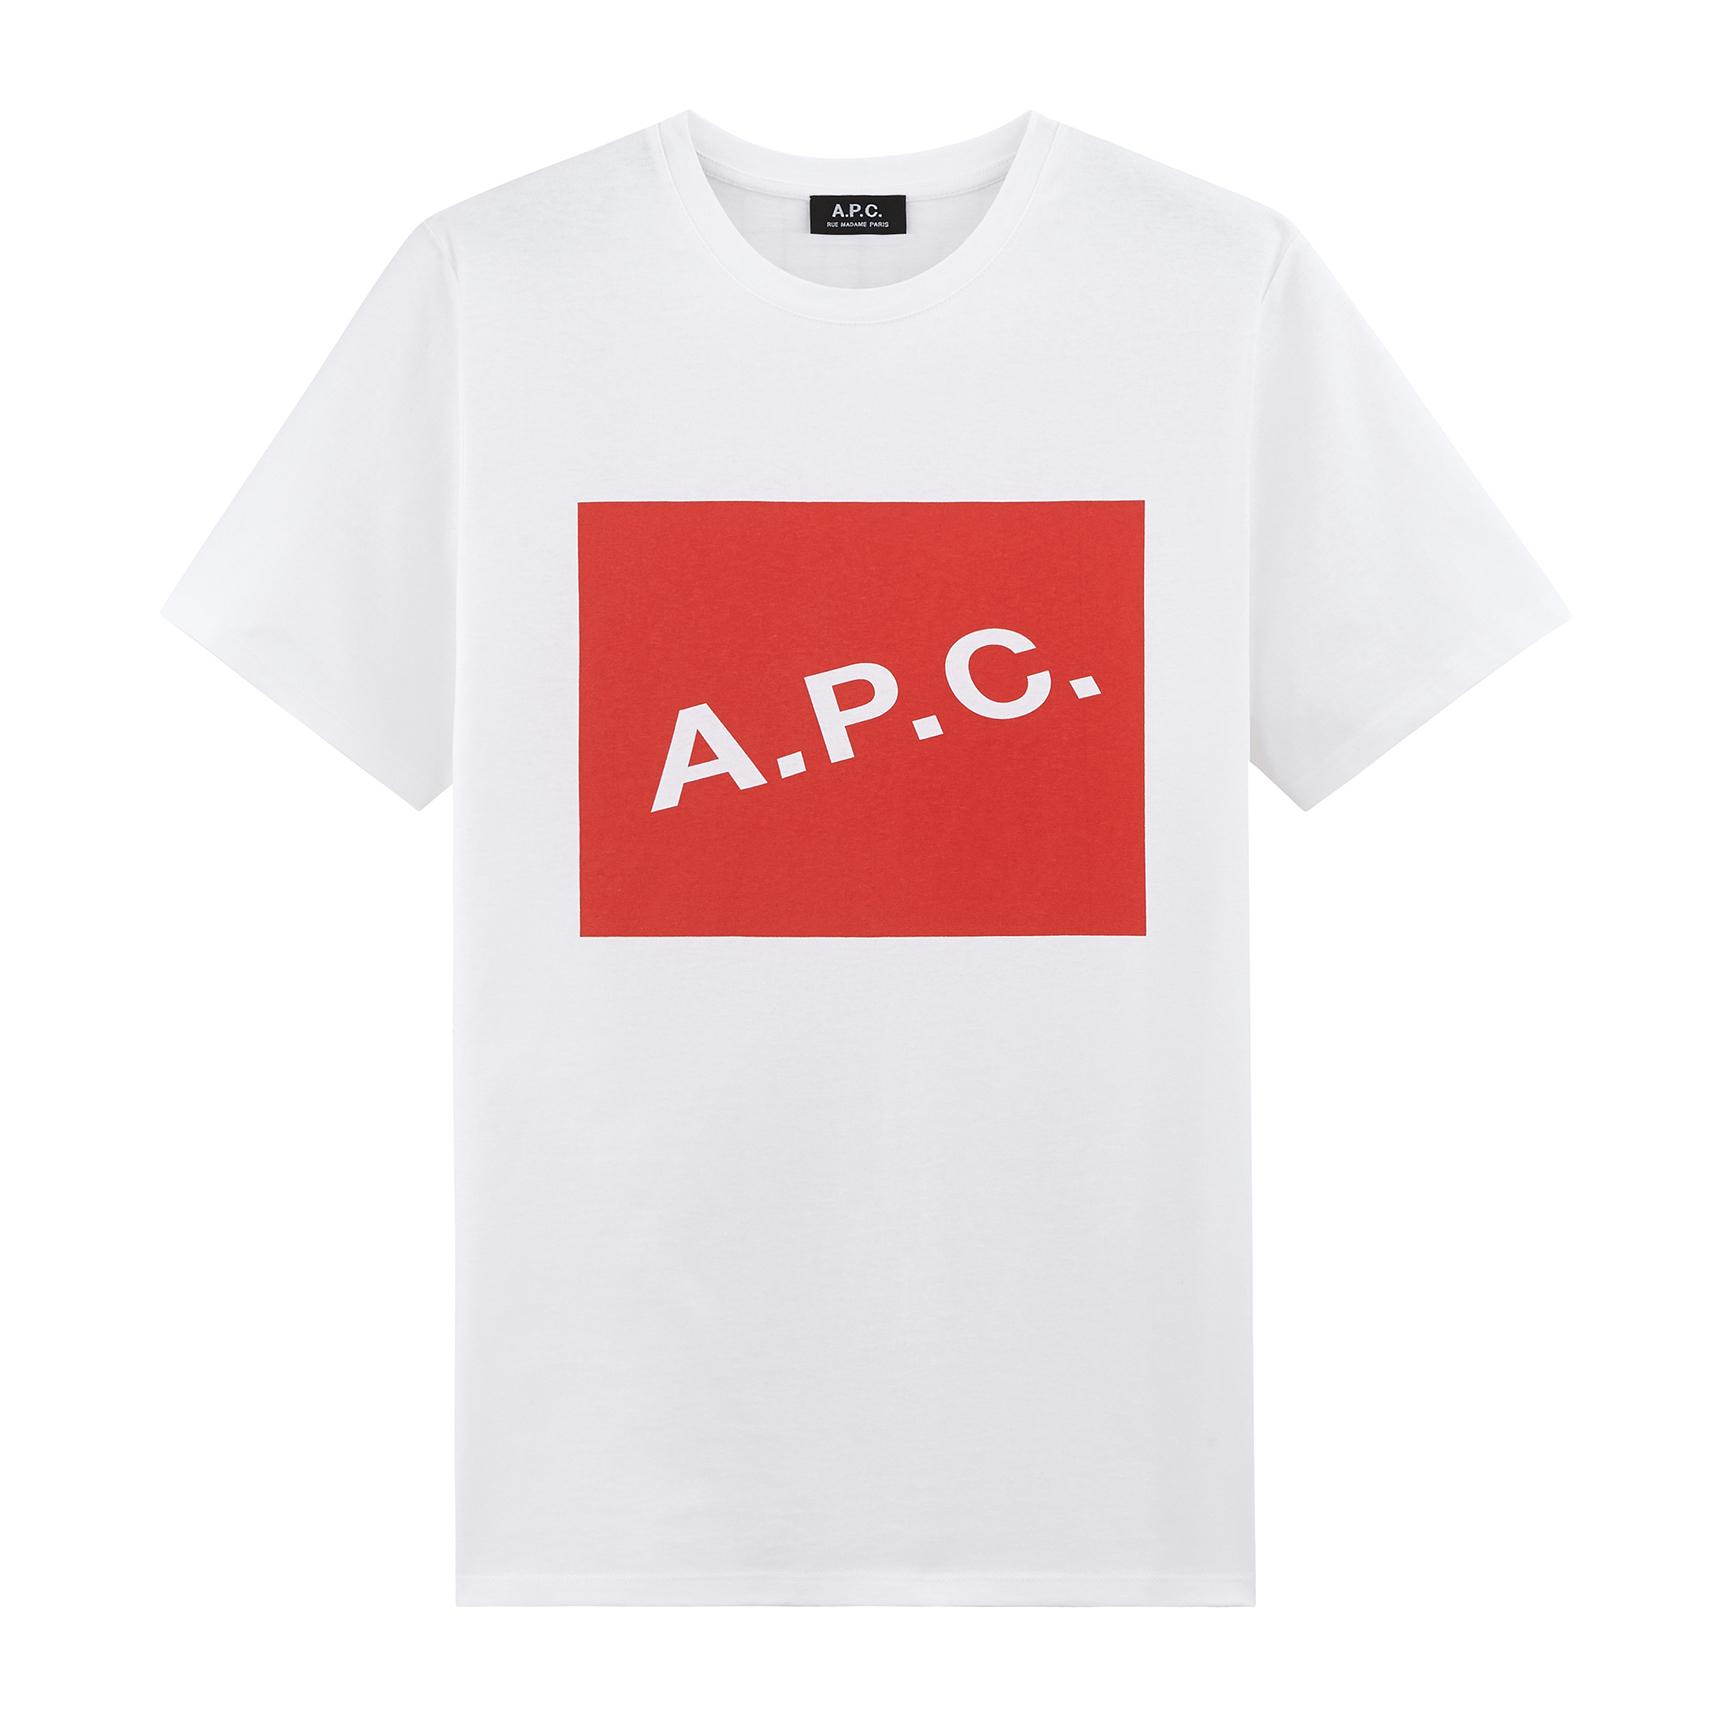 A.P.C. / Kraft 18p Tee -red